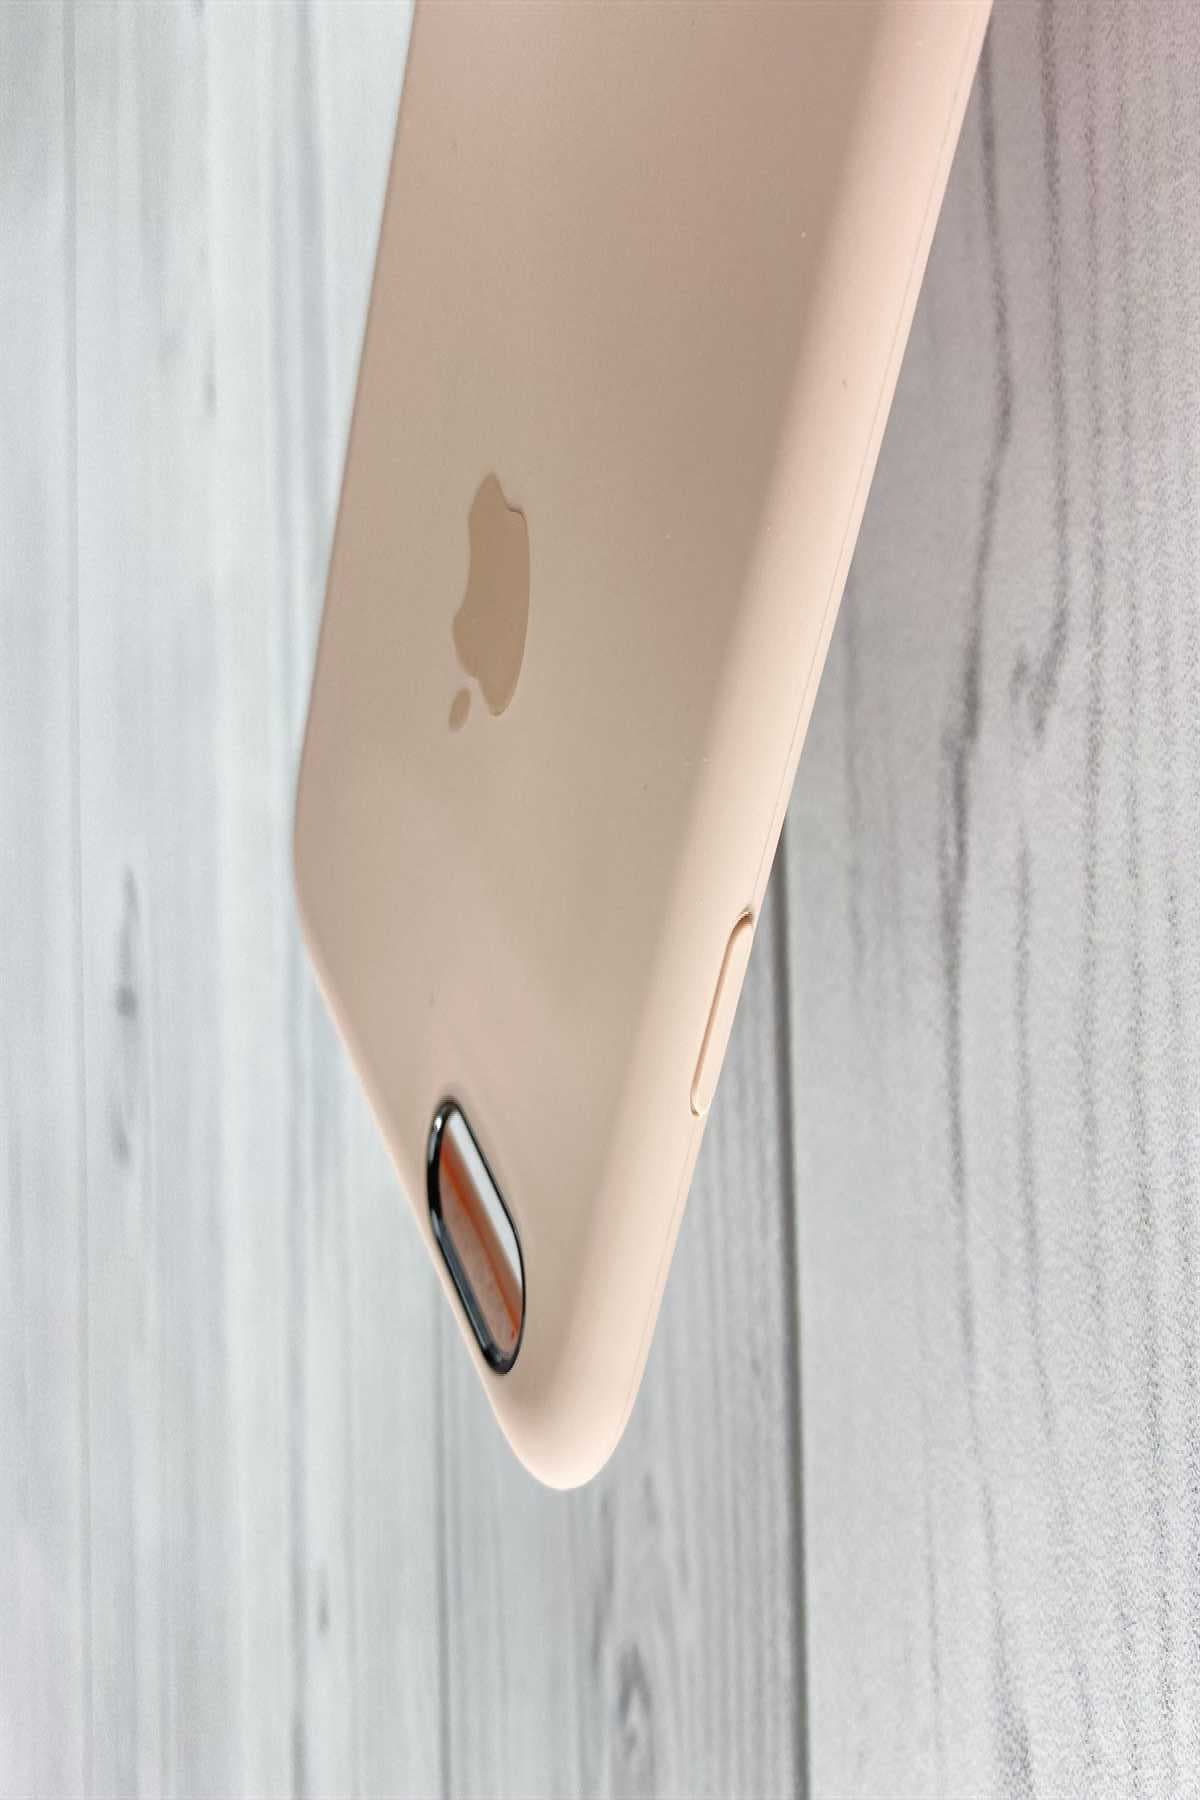 Iphone  Toz Pembe Lansman Kılıf 6/6s Plus